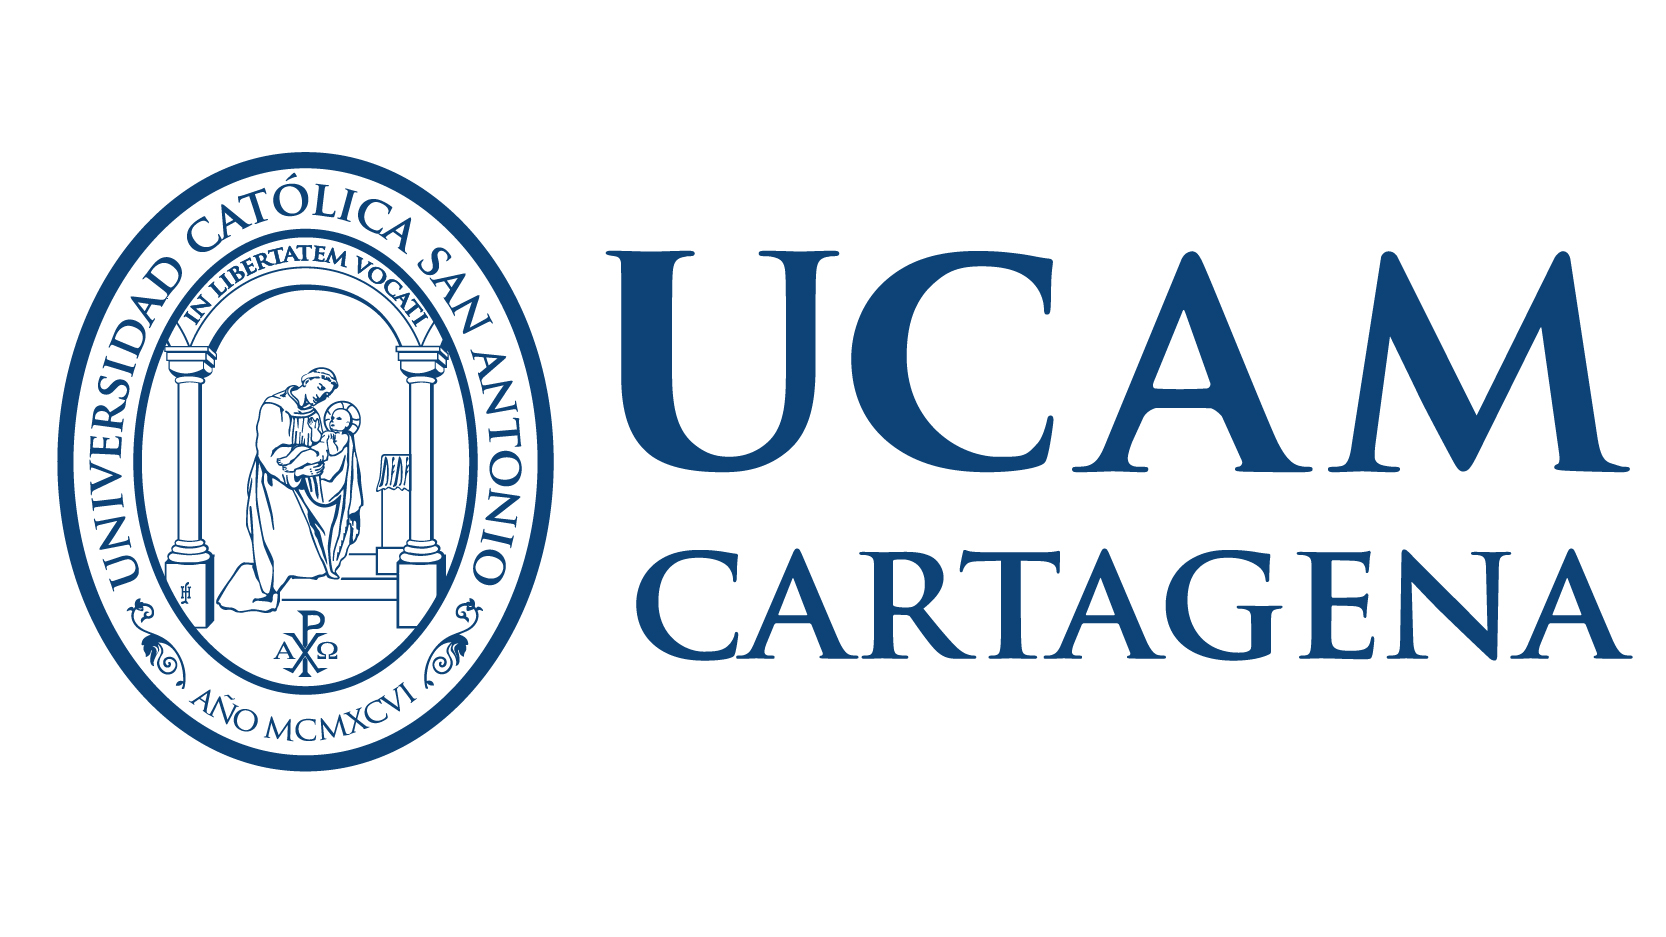 Logo UCAM cuadrado monocromo blanco